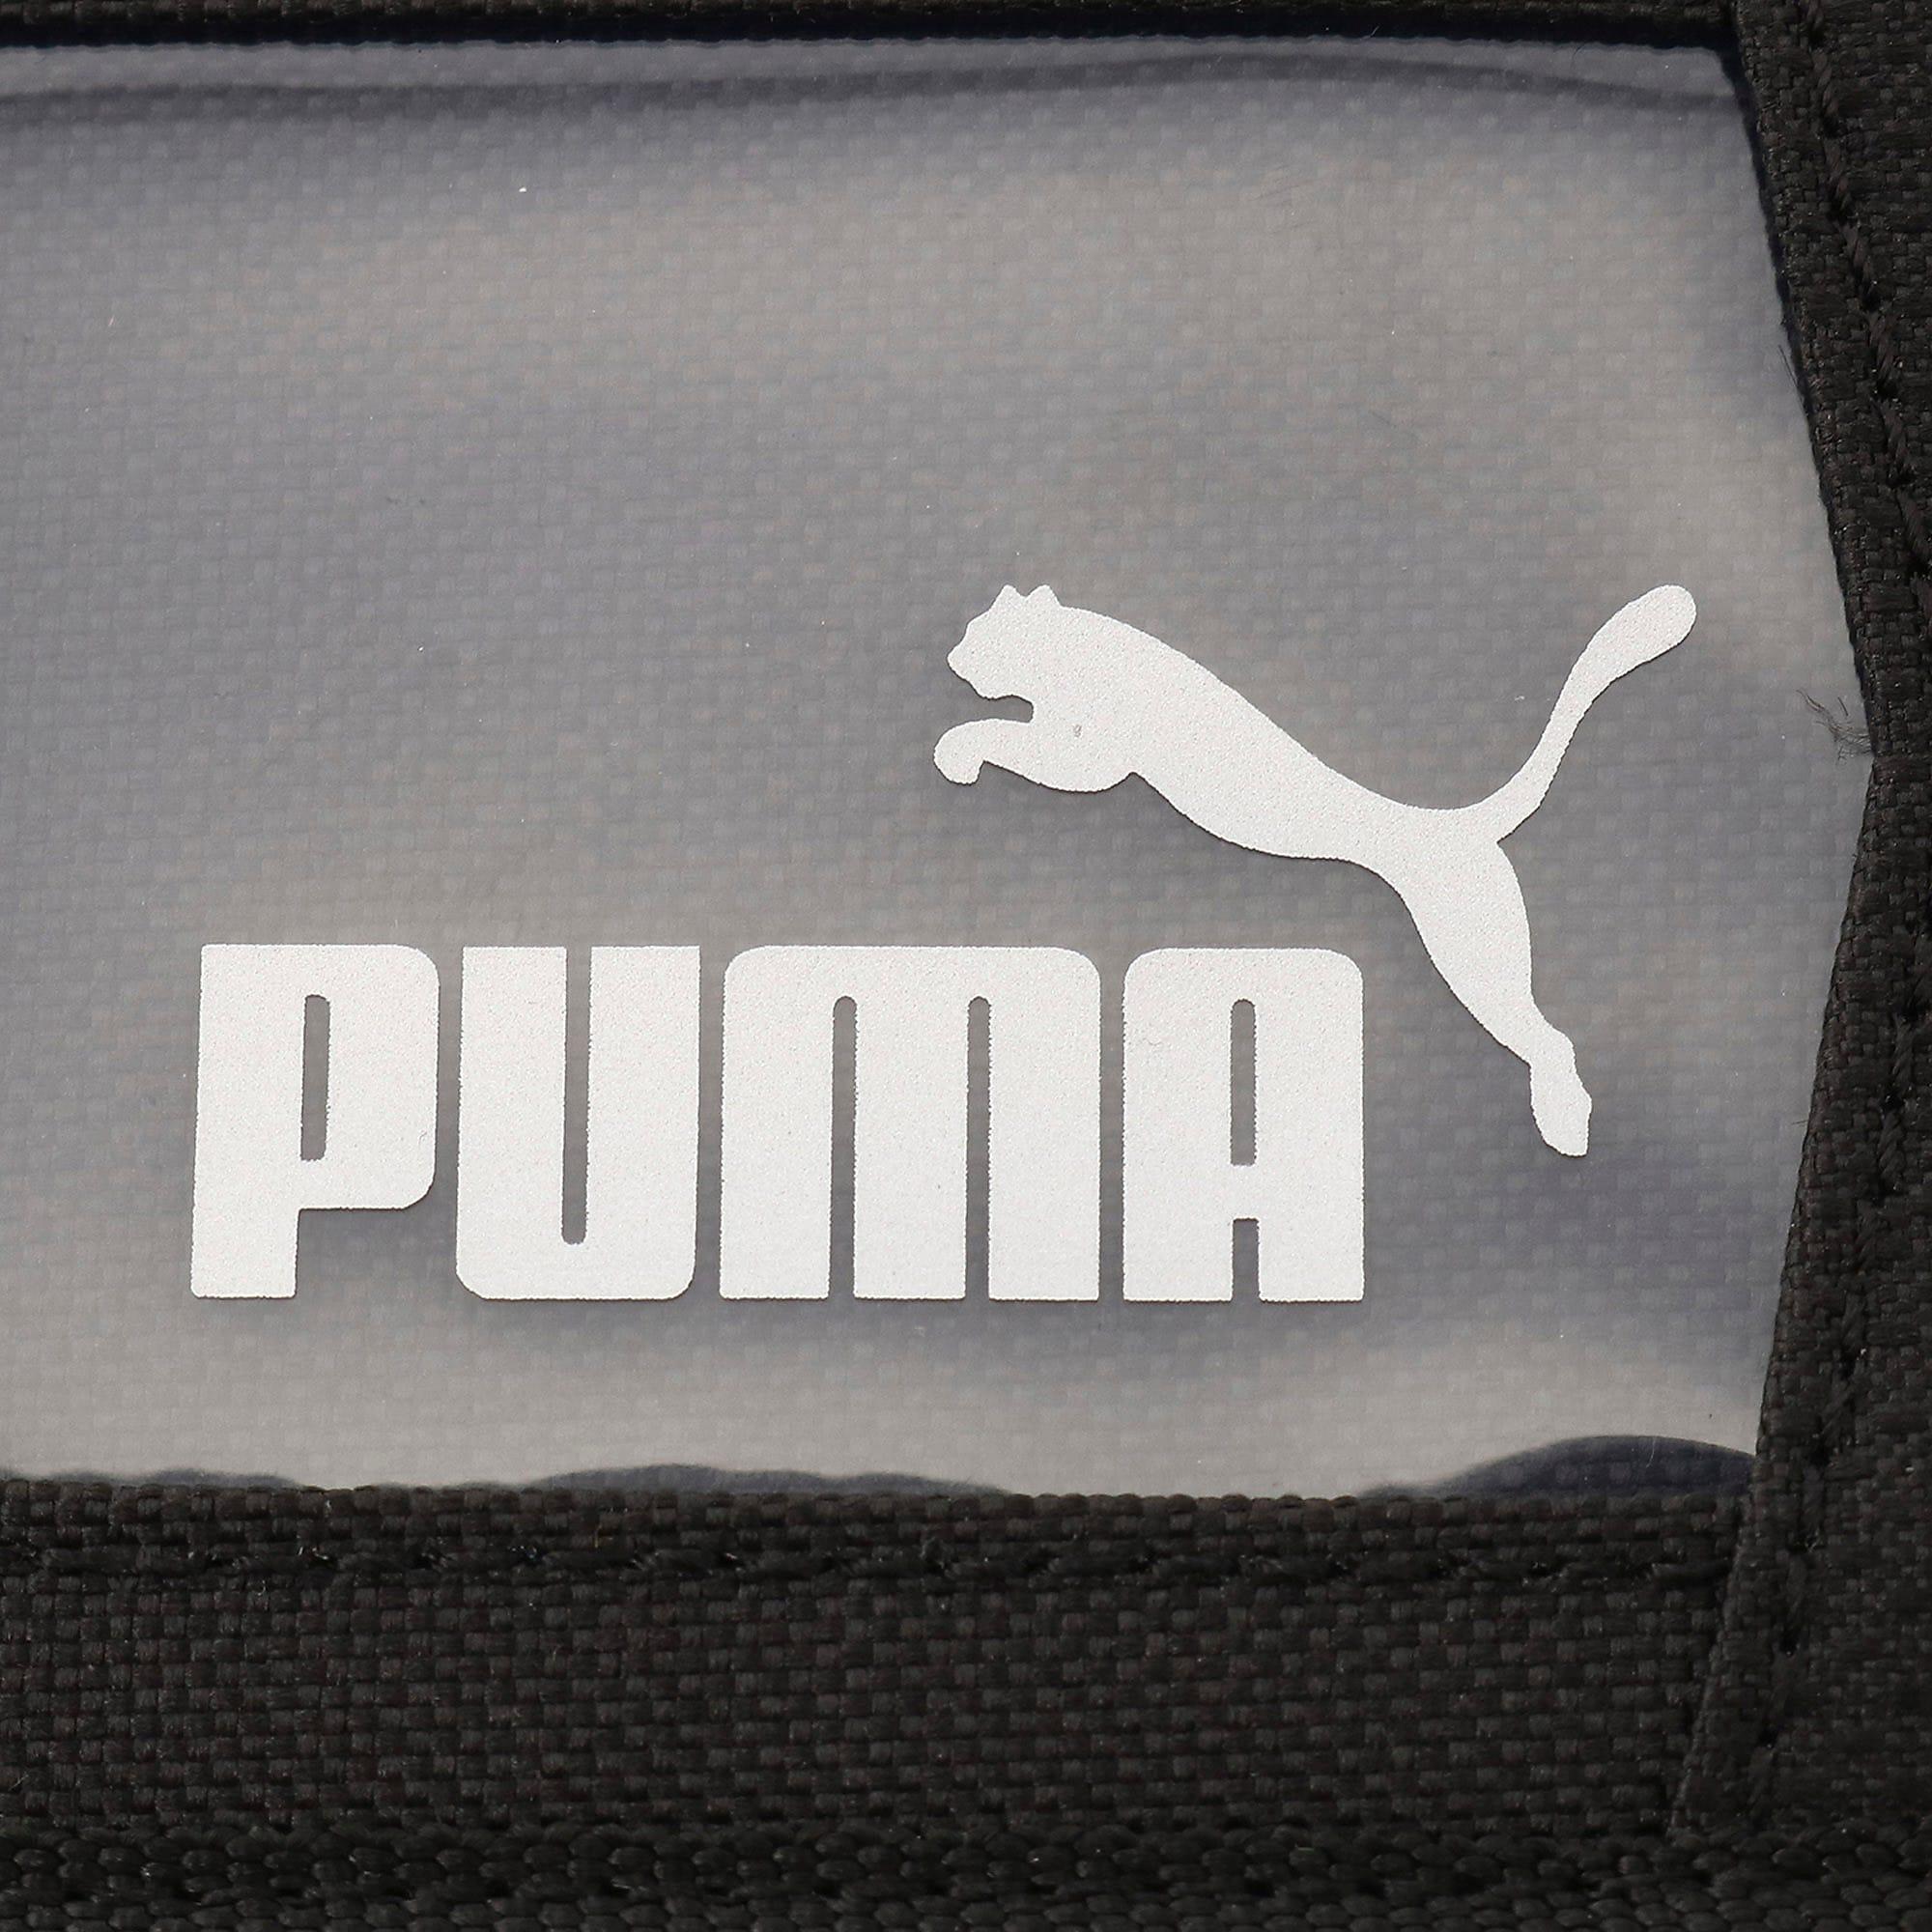 Thumbnail 3 of アクティブ カードホルダー, Puma Black-Silver, medium-JPN